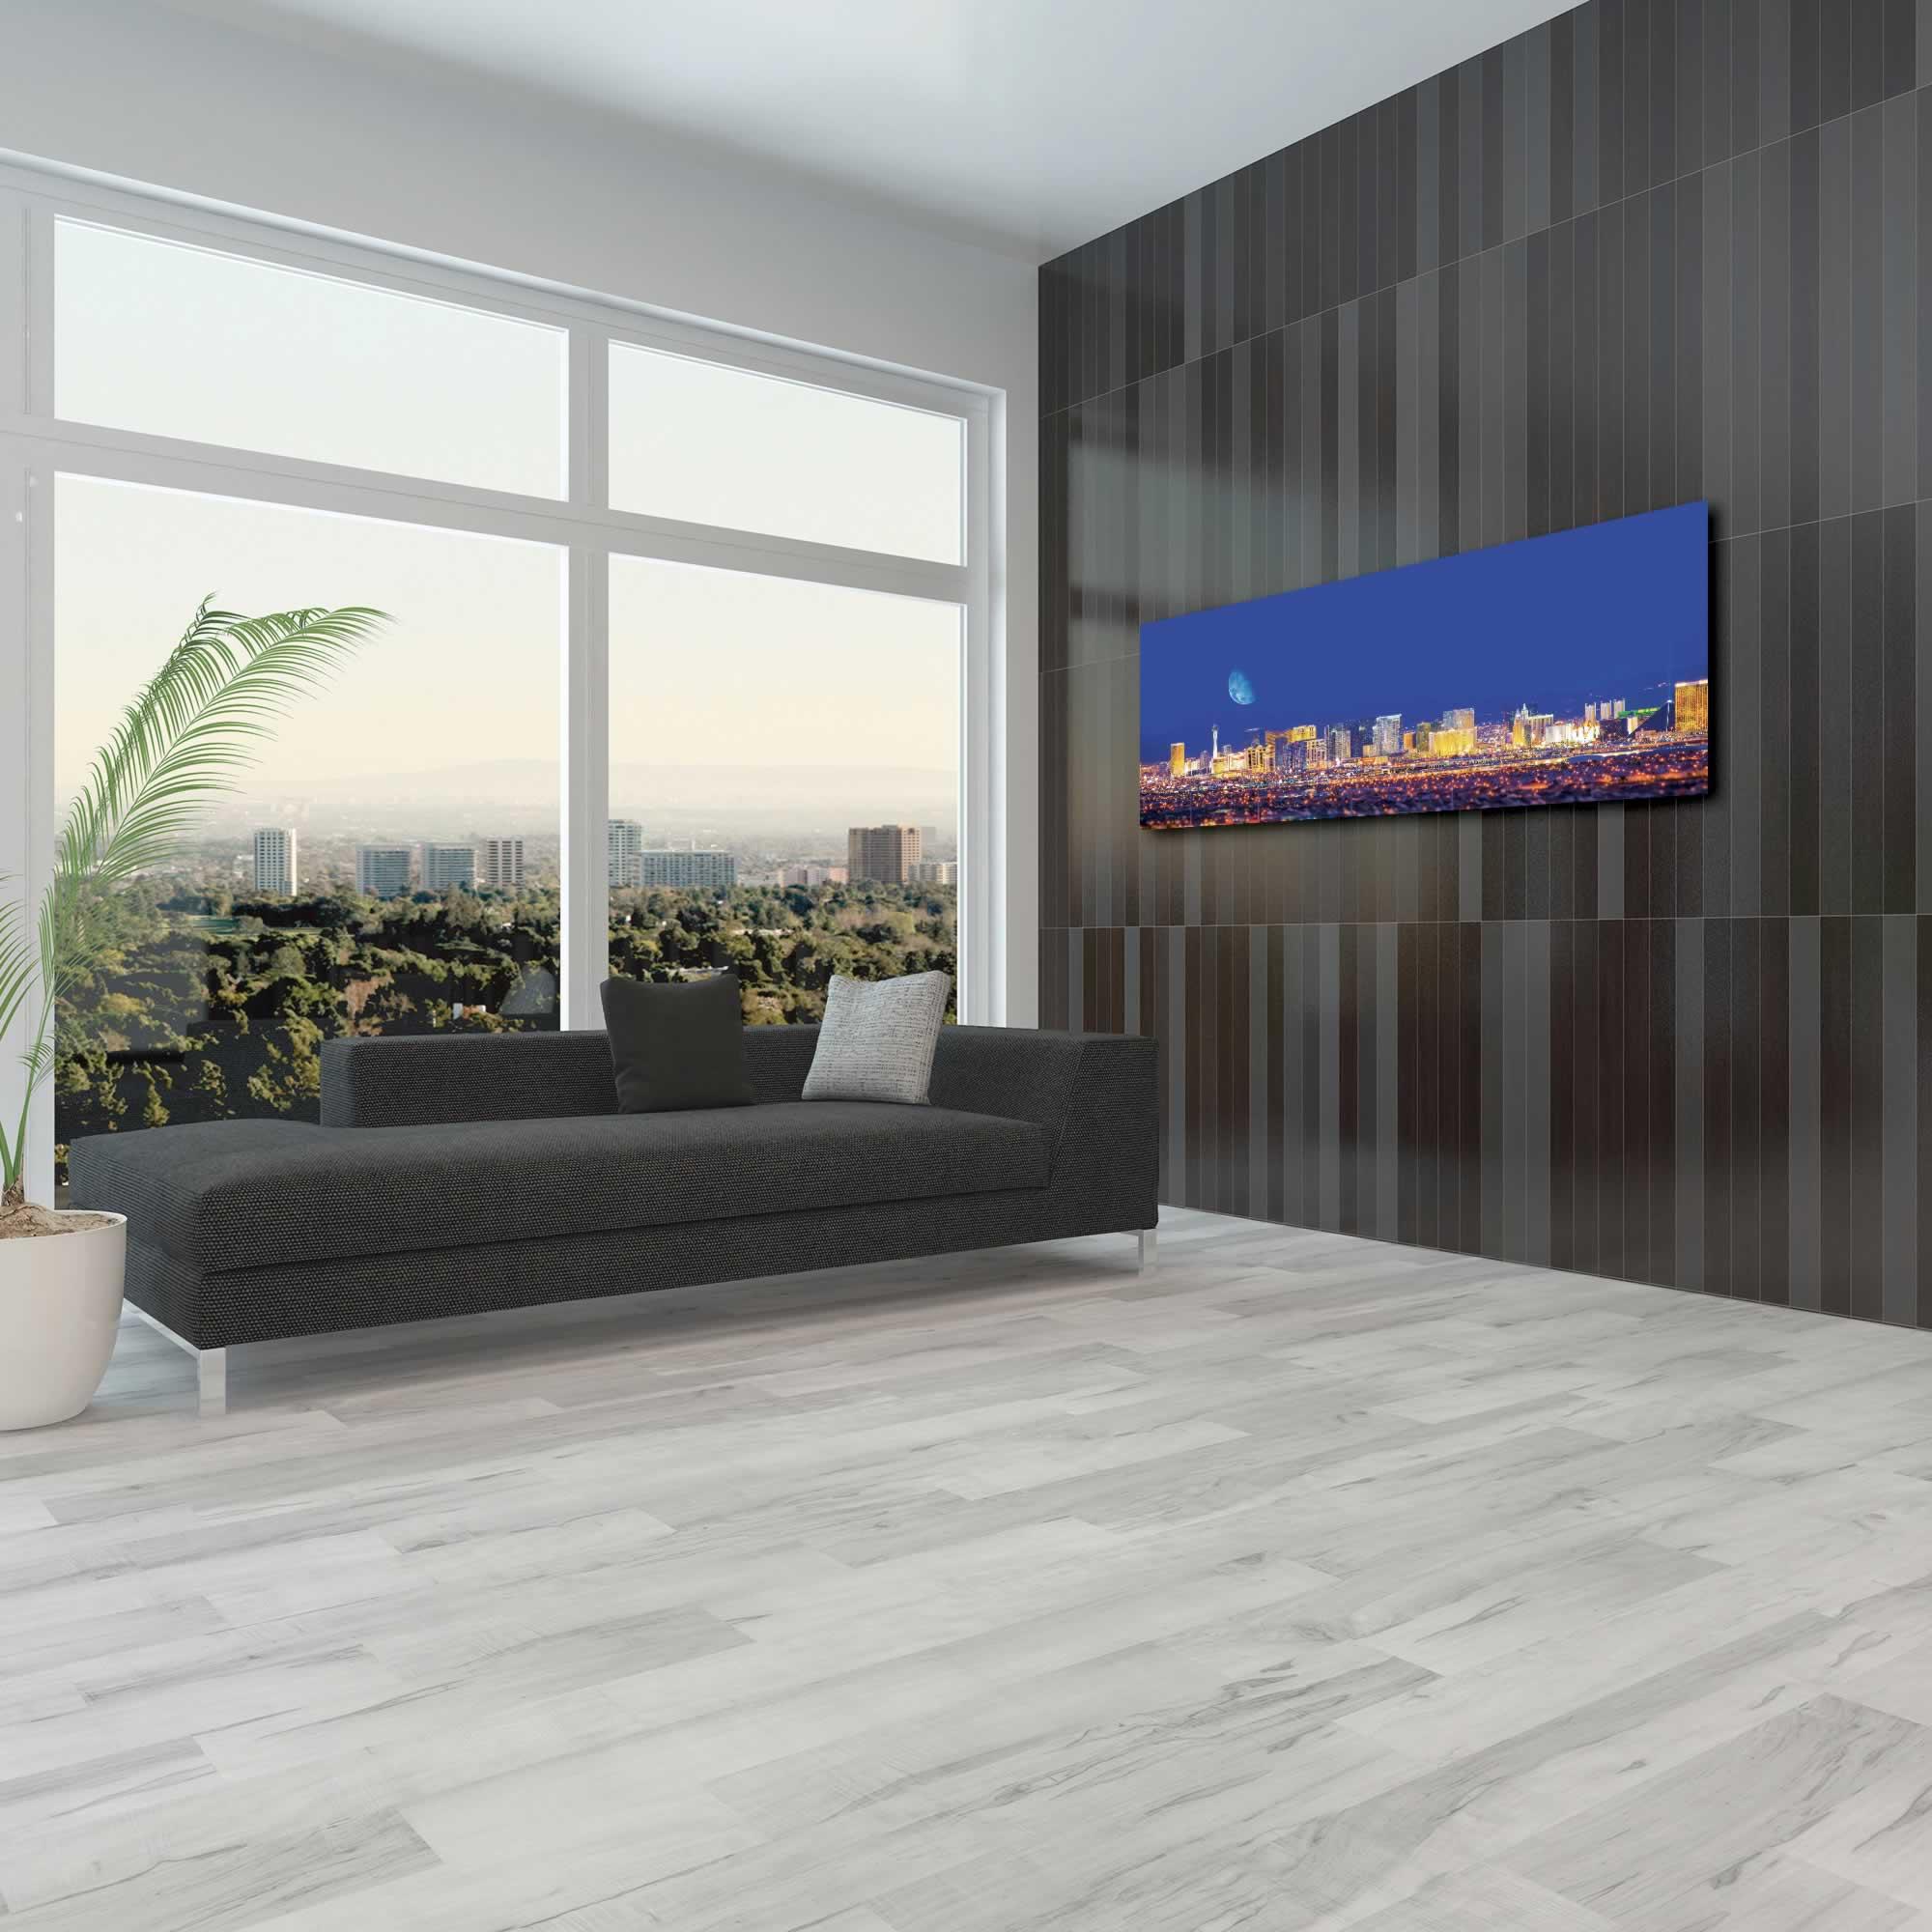 Las Vegas City Skyline - Urban Modern Art, Designer Home Decor, Cityscape Wall Artwork, Trendy Contemporary Art - Alternate View 3